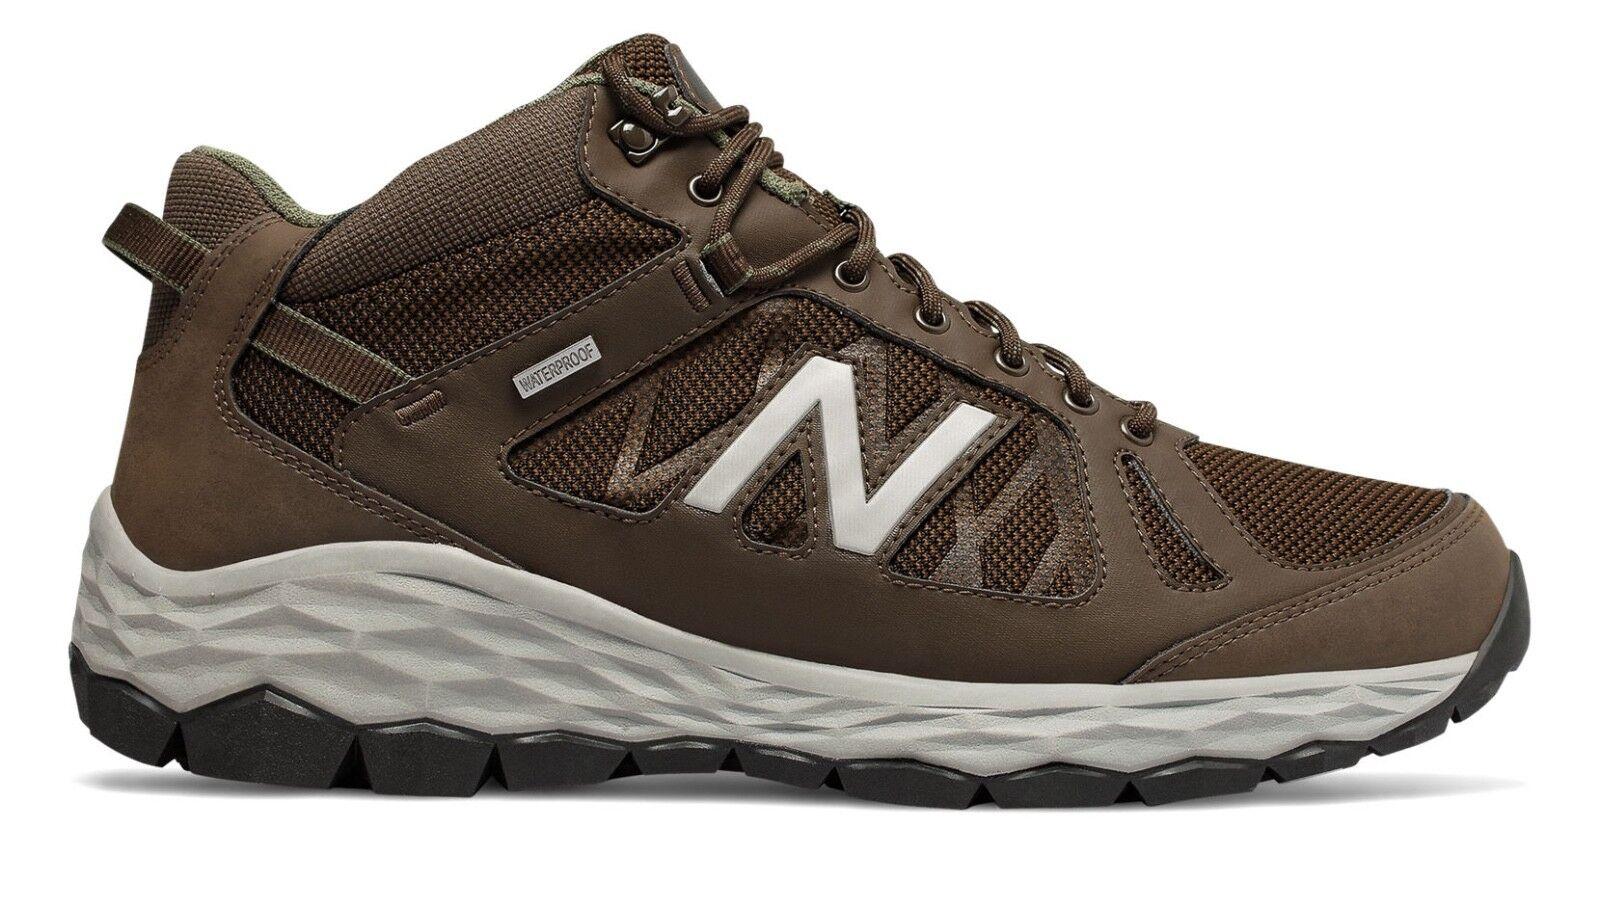 Men's New Balance 1450 US 7 1/2 2E MW1450WN Trail Walking